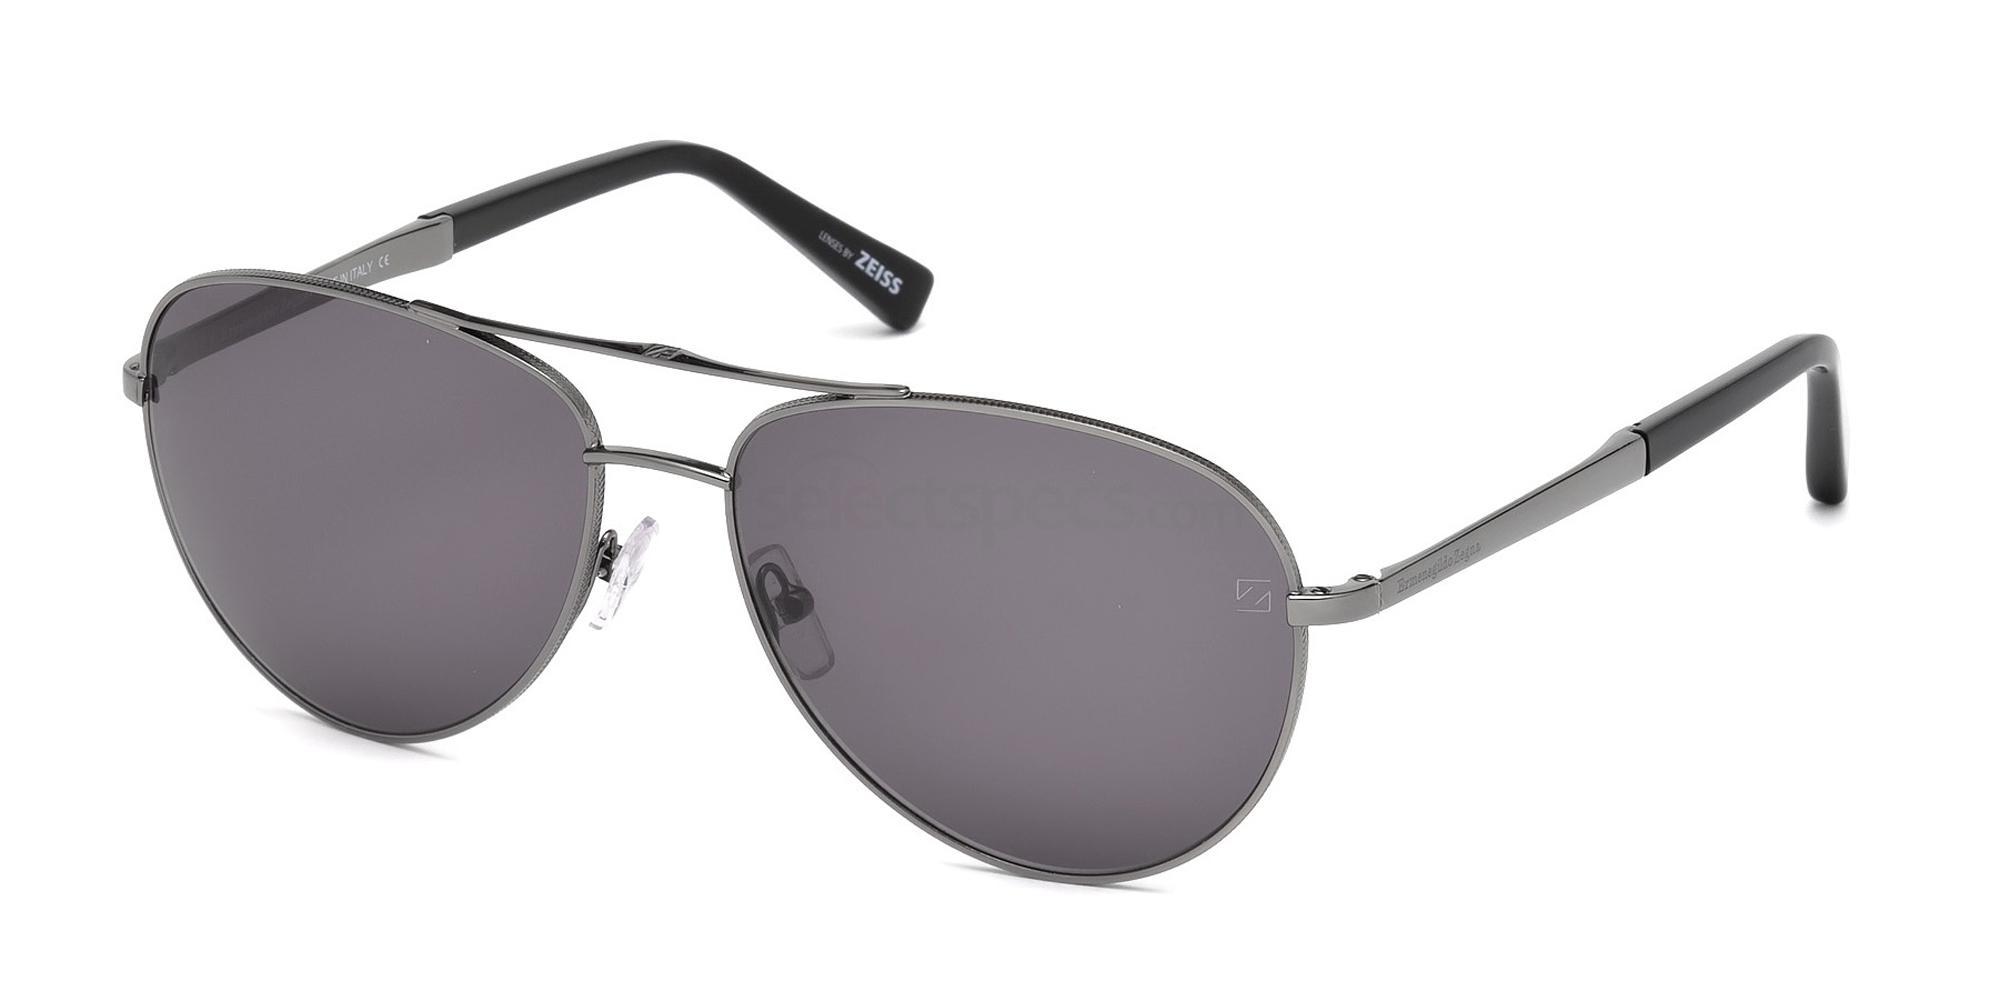 12A EZ0035 Sunglasses, Ermenegildo Zegna